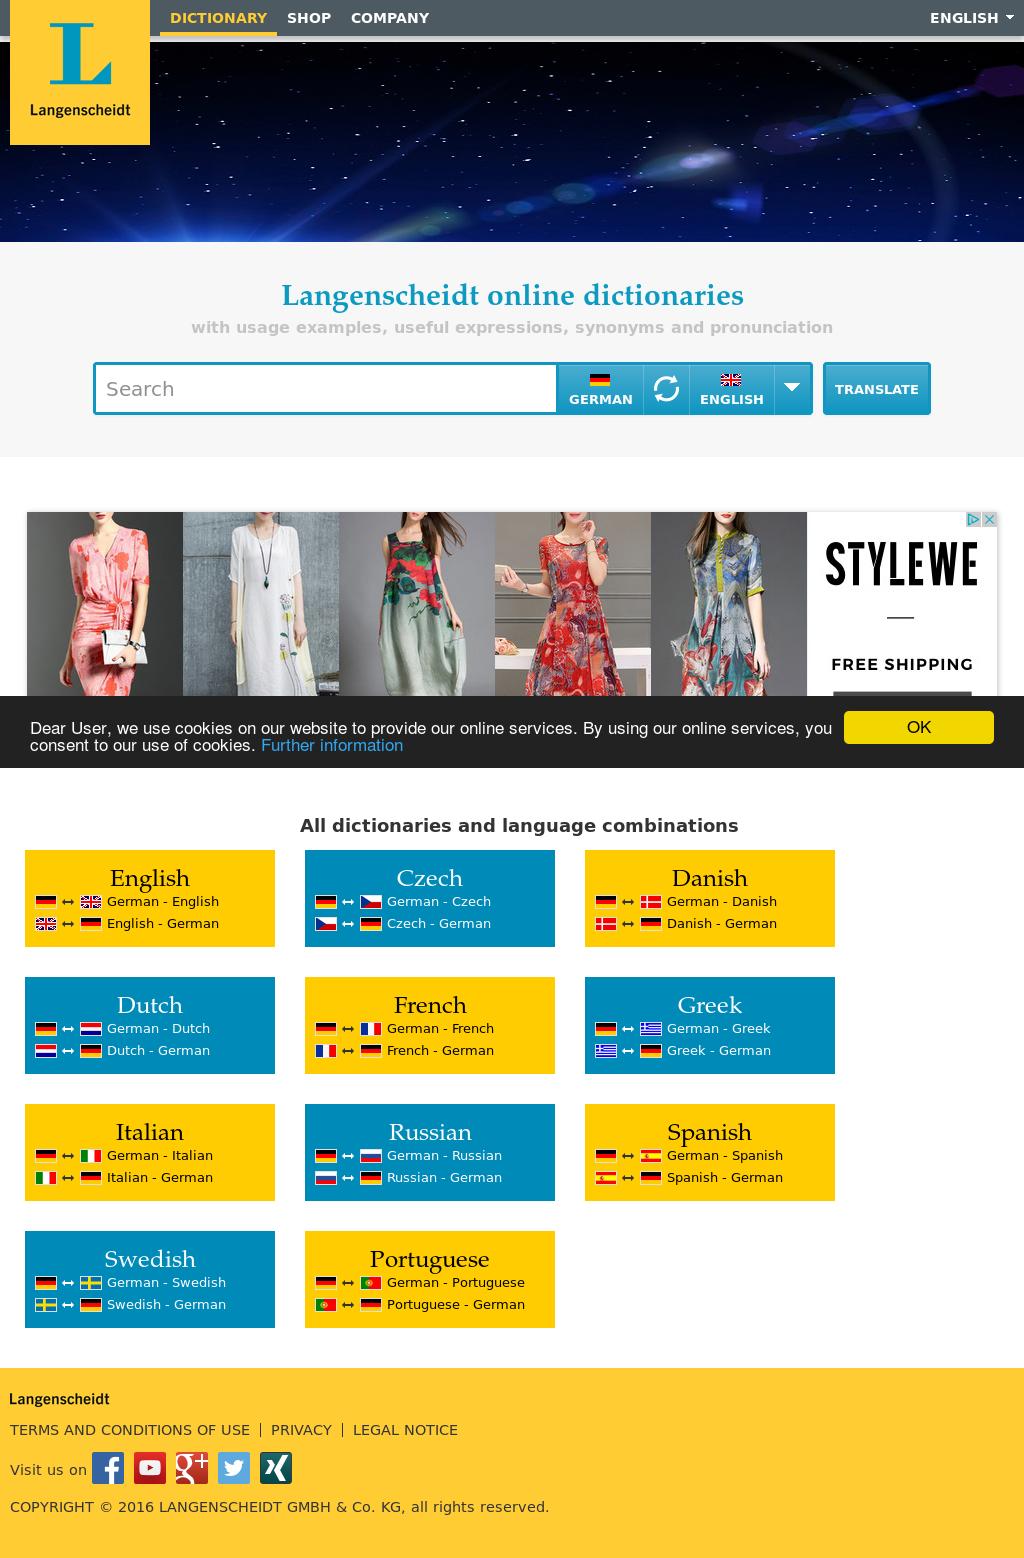 Langenscheidt Publishing Group Competitors, Revenue and